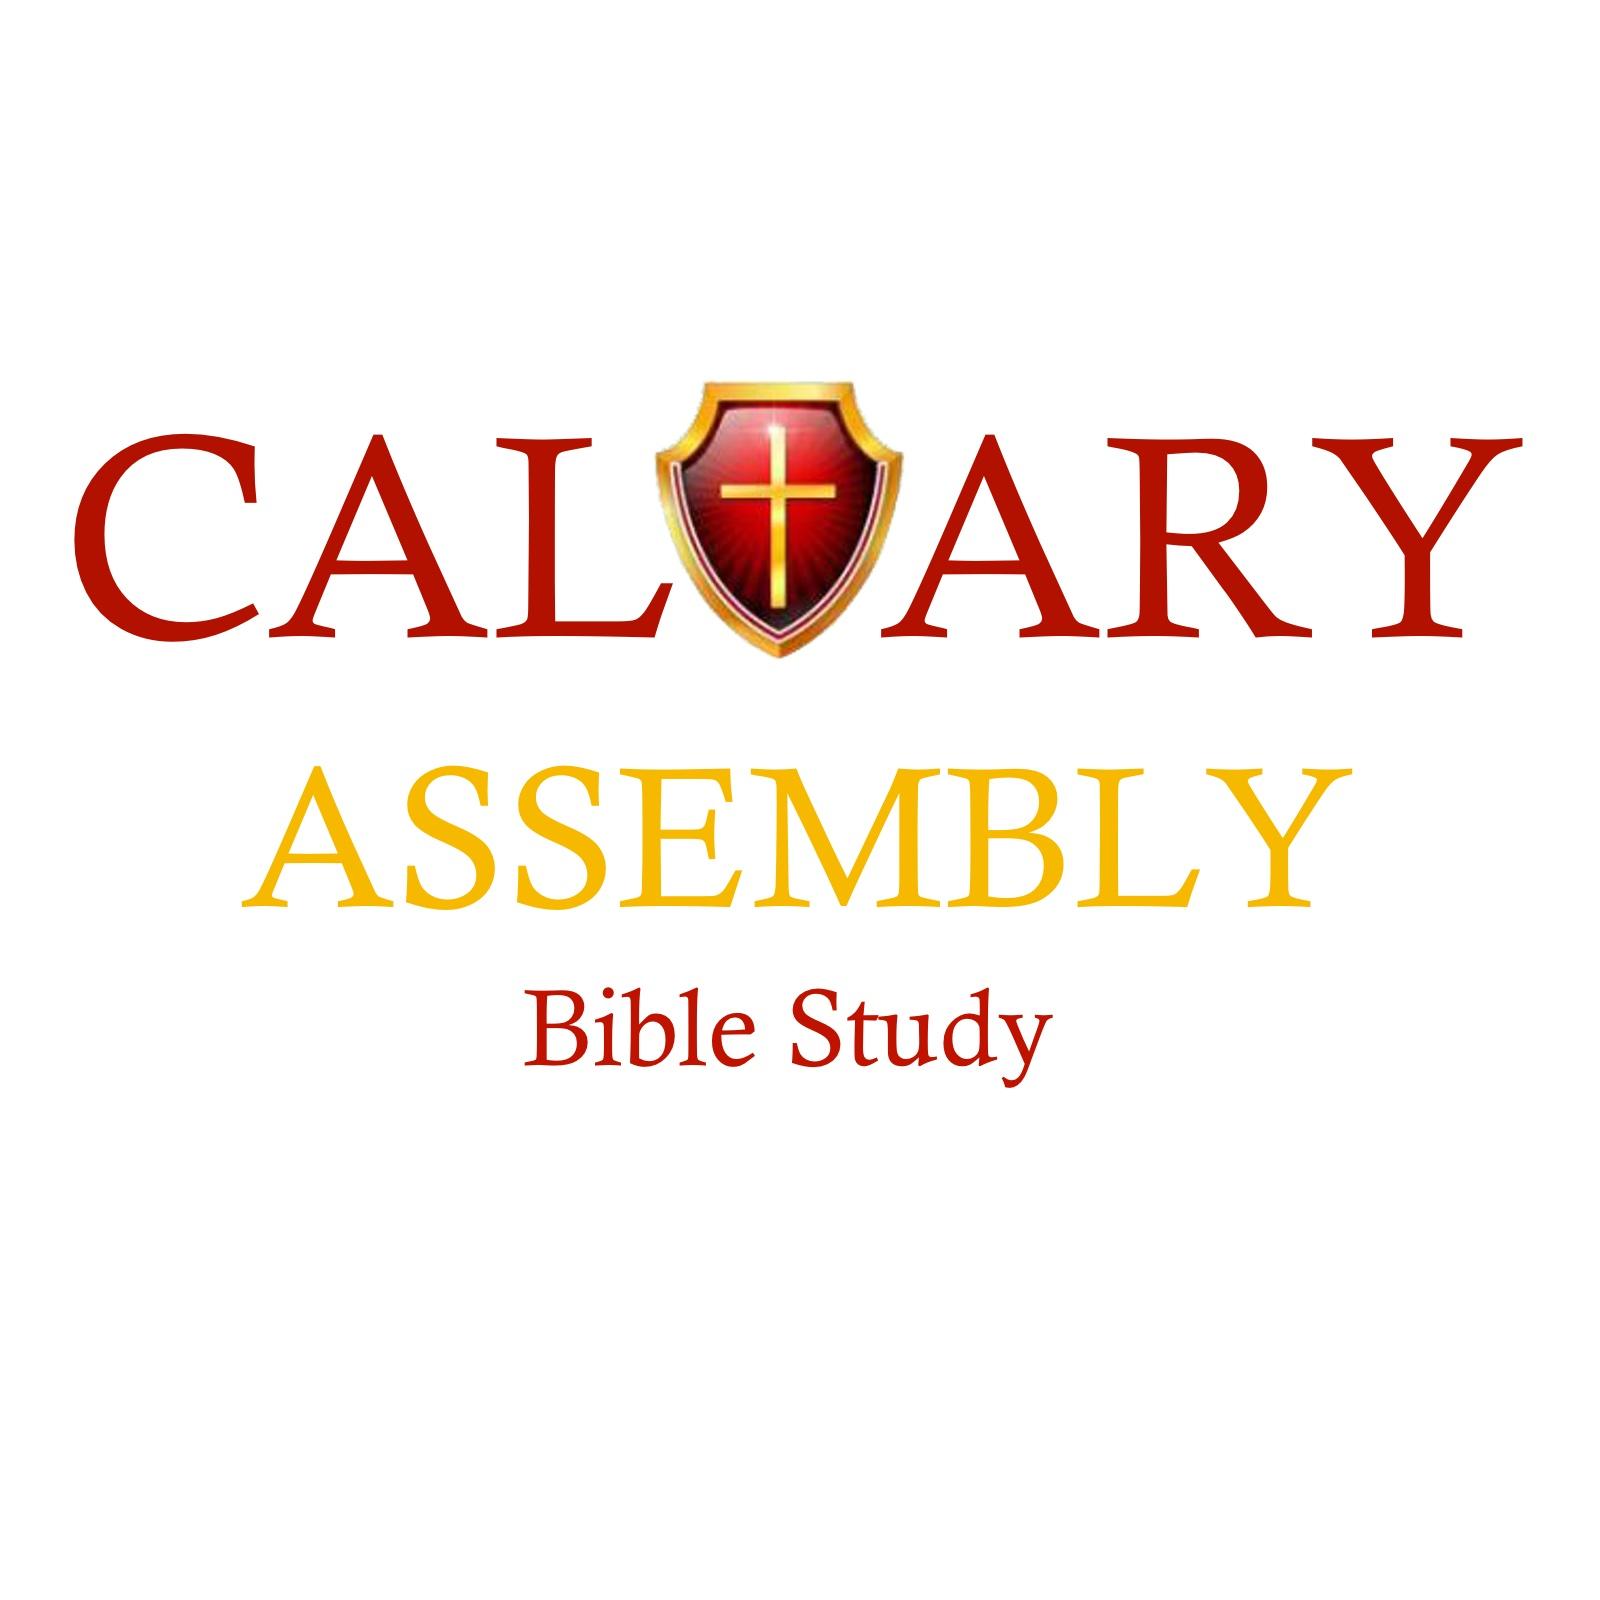 CA Bible Study Album Art.jpg